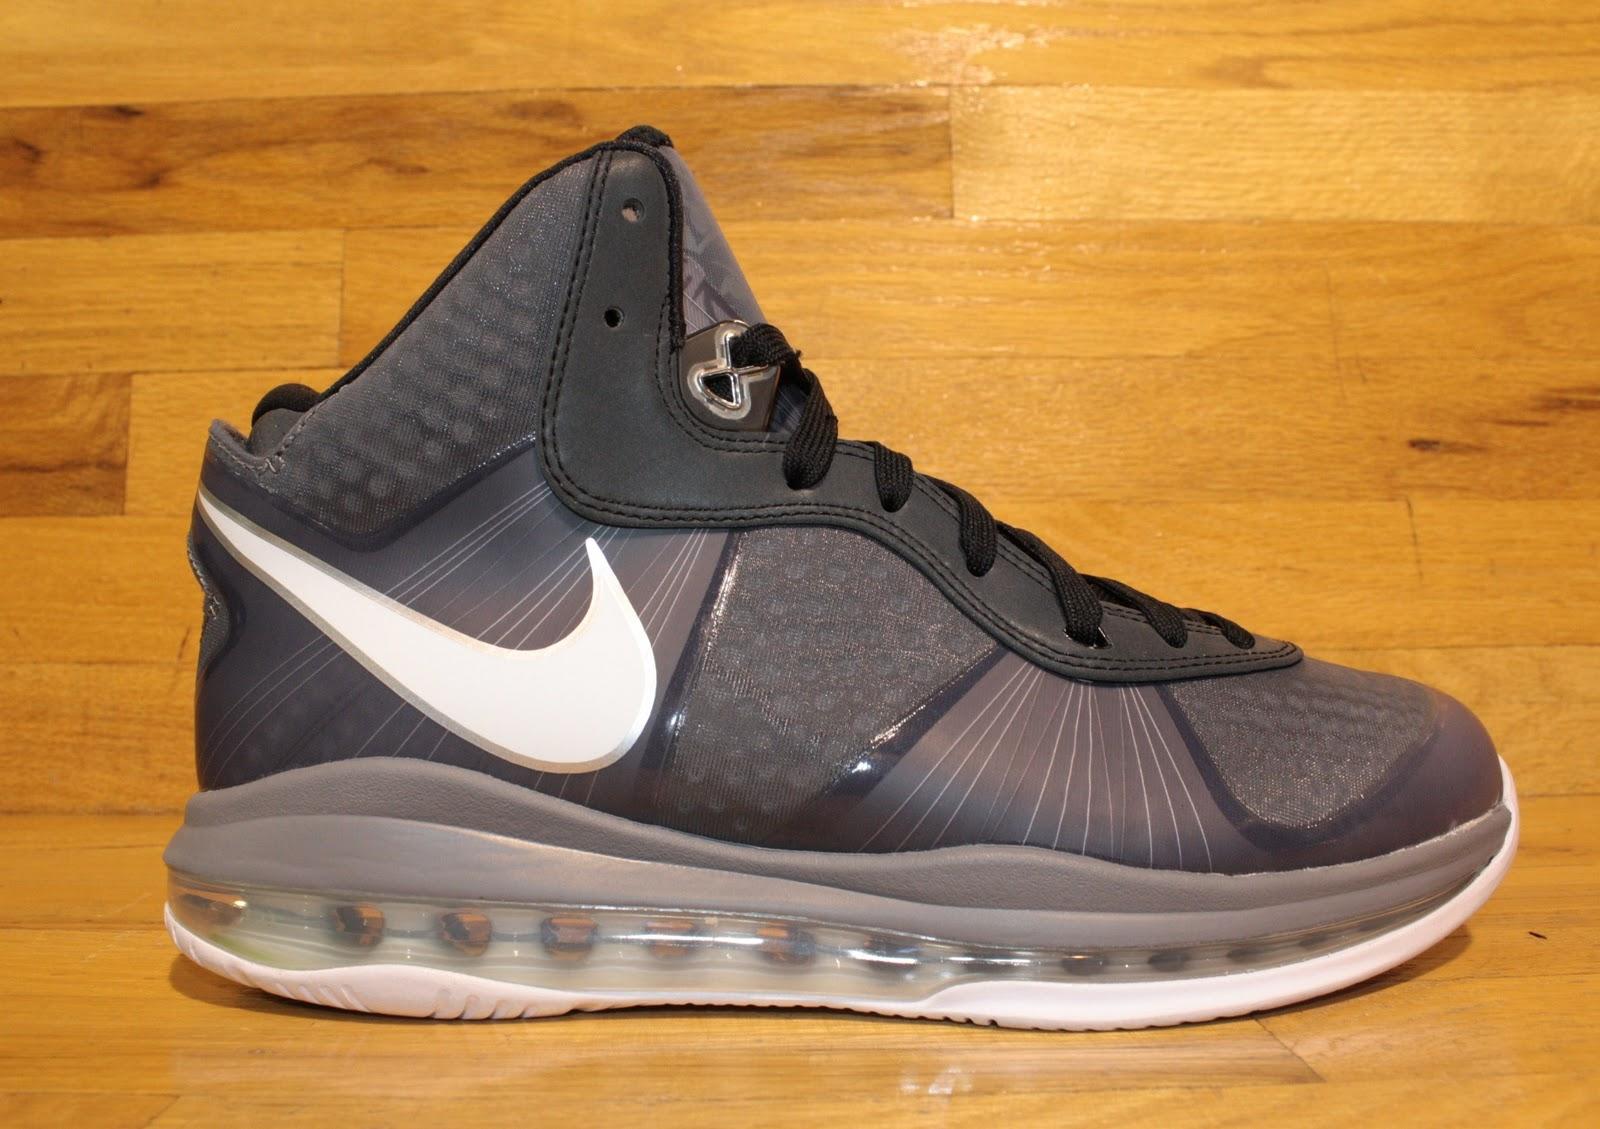 1e845e43bd41 Dr. Jays Stores  New Nike Lebron 8 V2